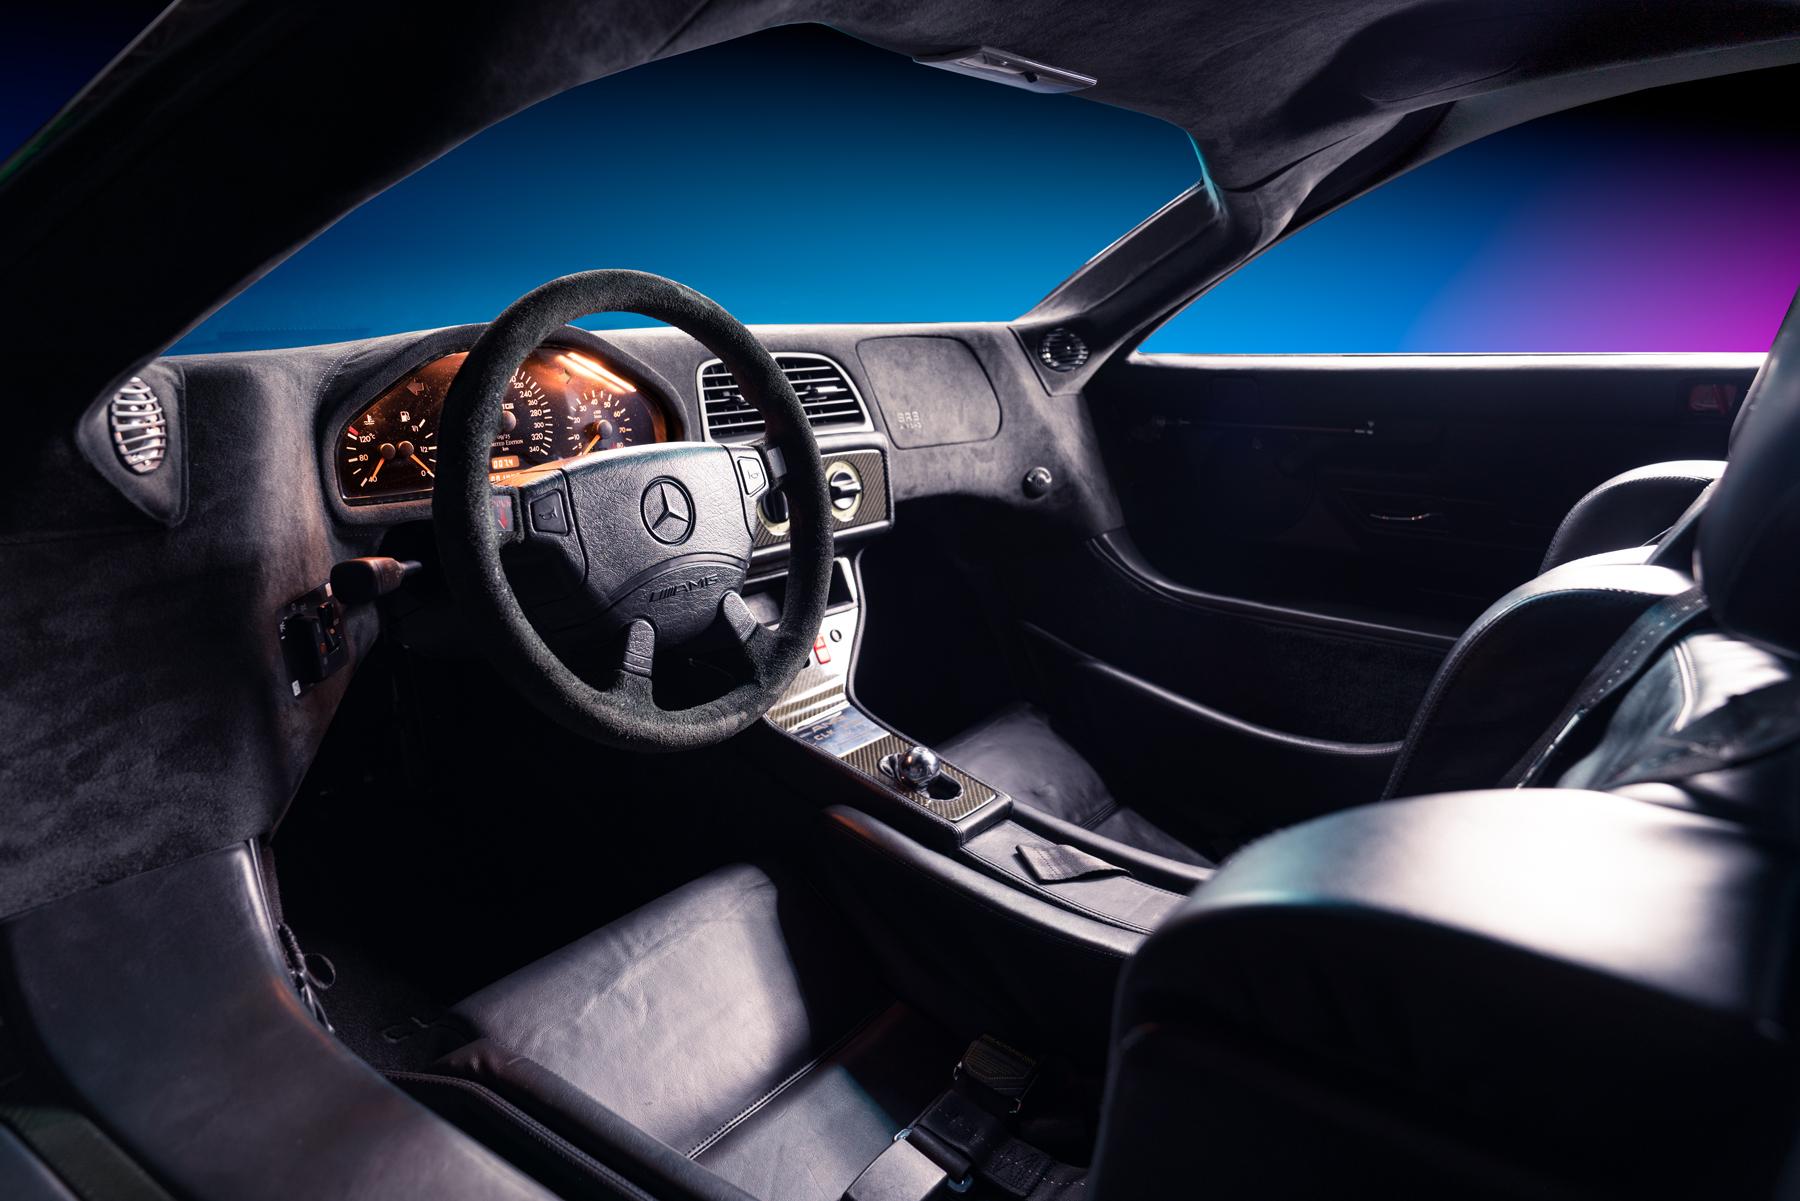 1998 Mercedes-Benz AMG CLK GTR interior studio